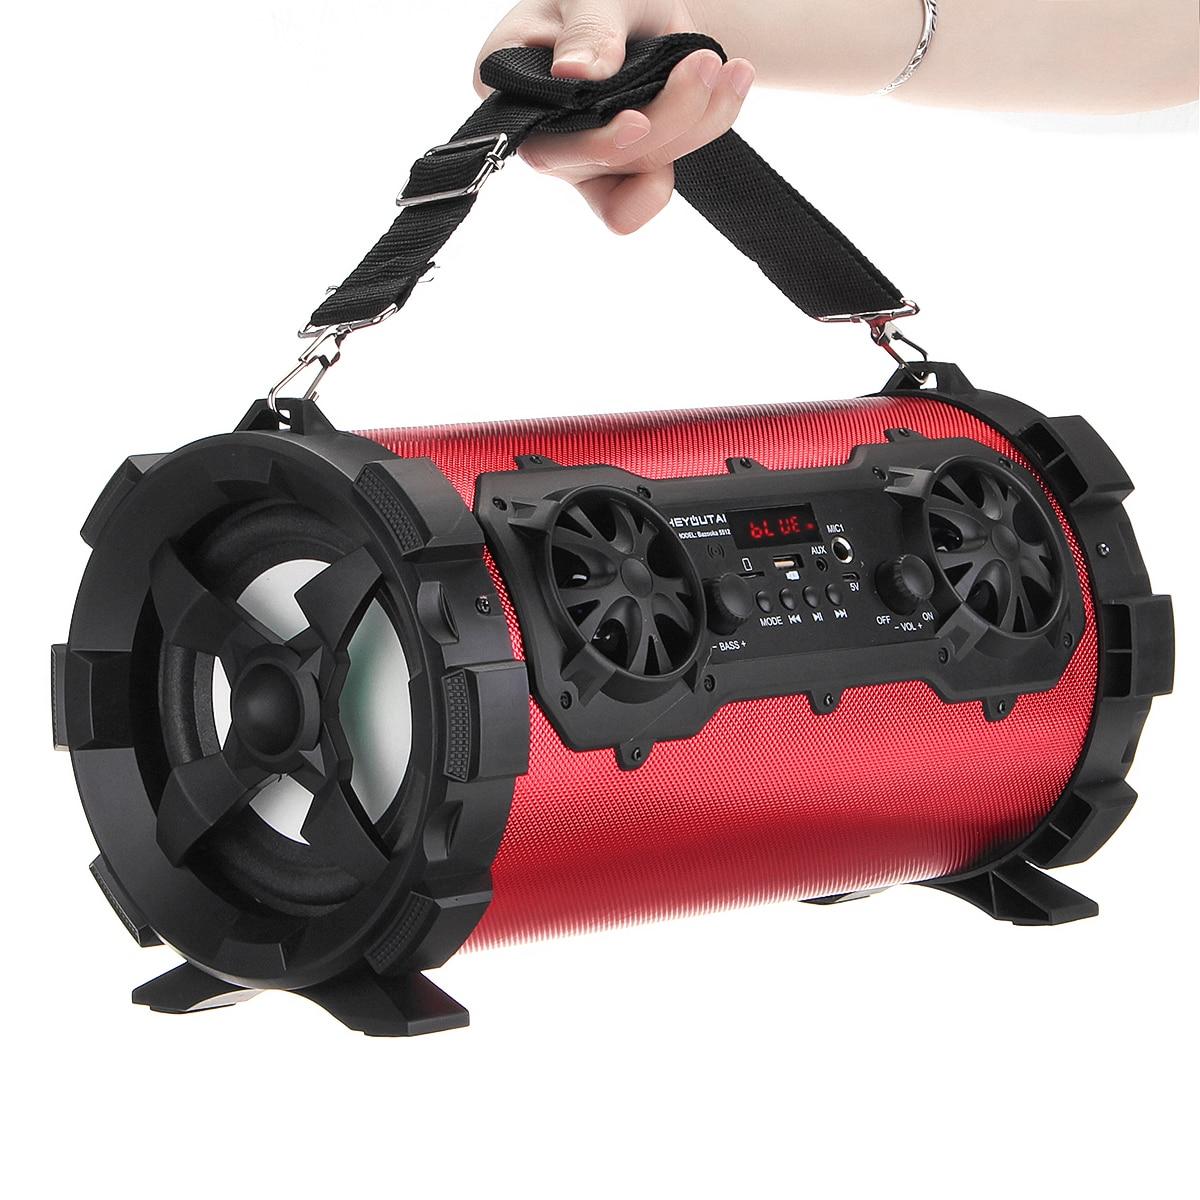 Speaker bluetooth Wireless Stereo Bass Portable HIFI Speaker Subwoofer AUX USB TF Card FM Radio Outdoor Bike Car Karaoke Player enlarge